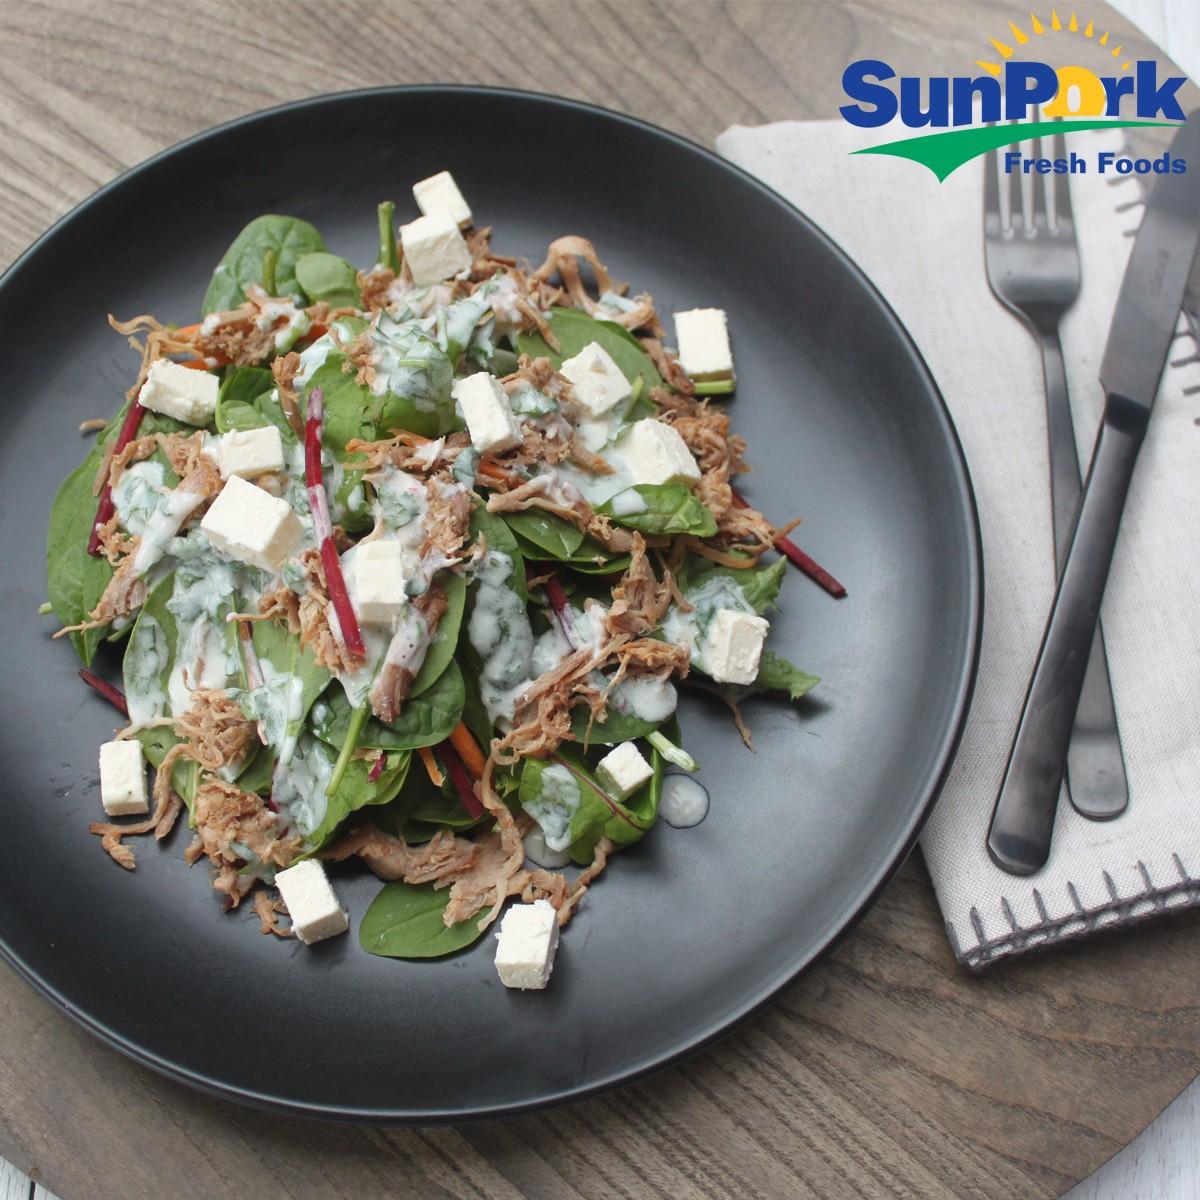 Pulled Pork and Feta Salad - Three Aussie Farmers Pulled Pork